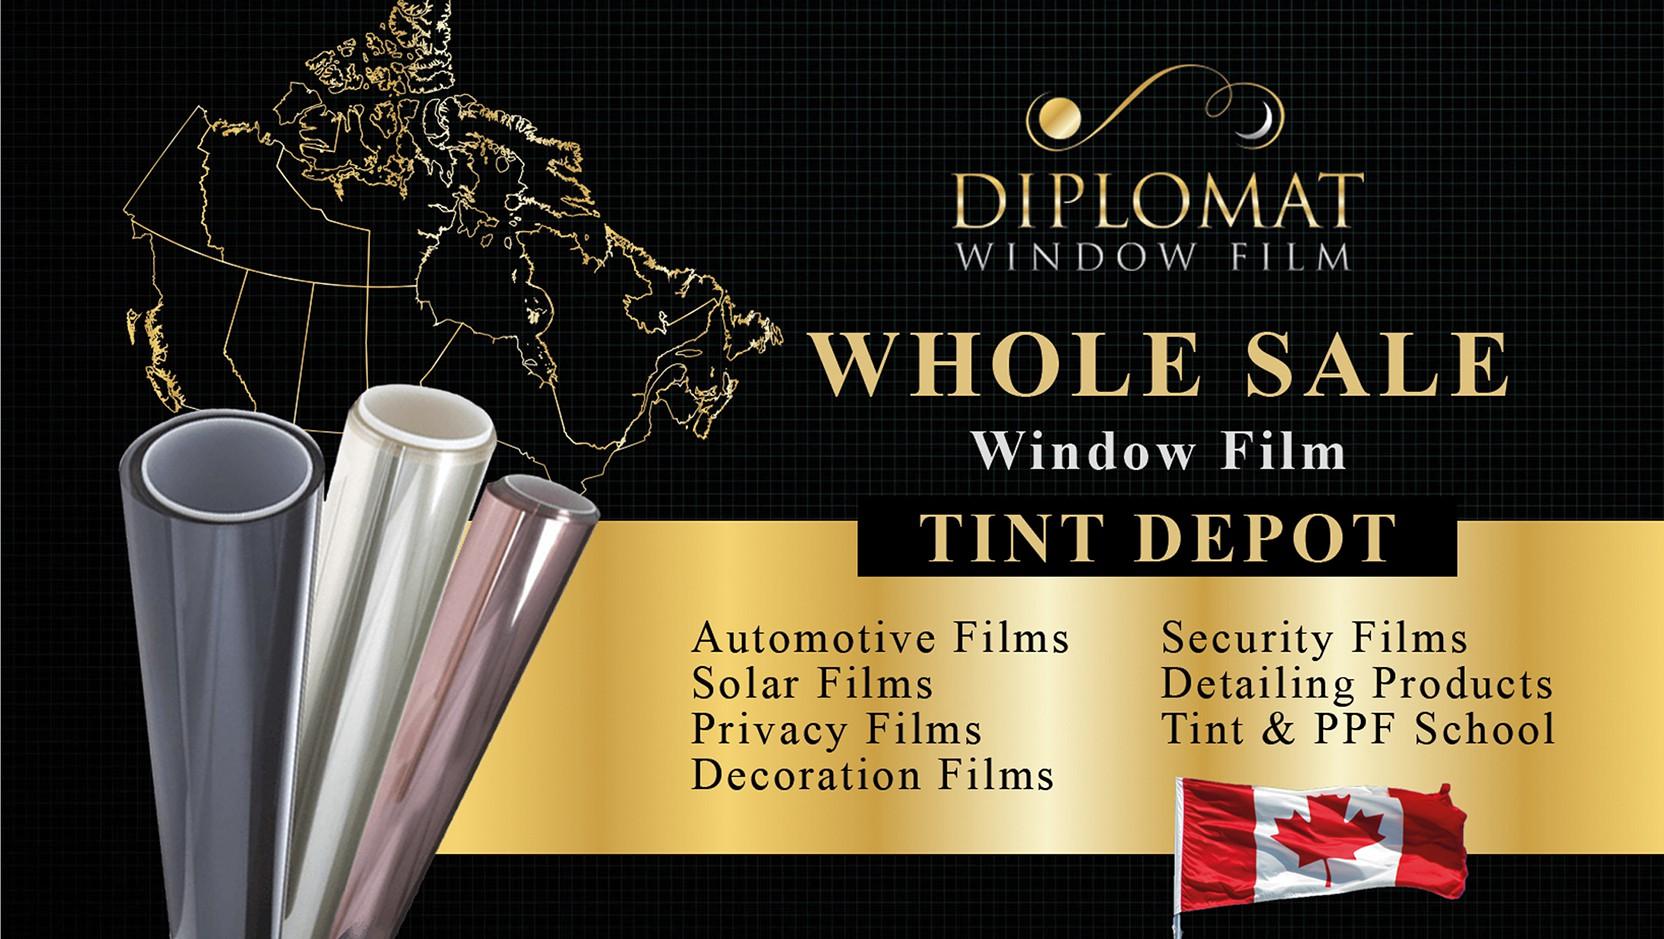 whole sale tint depot